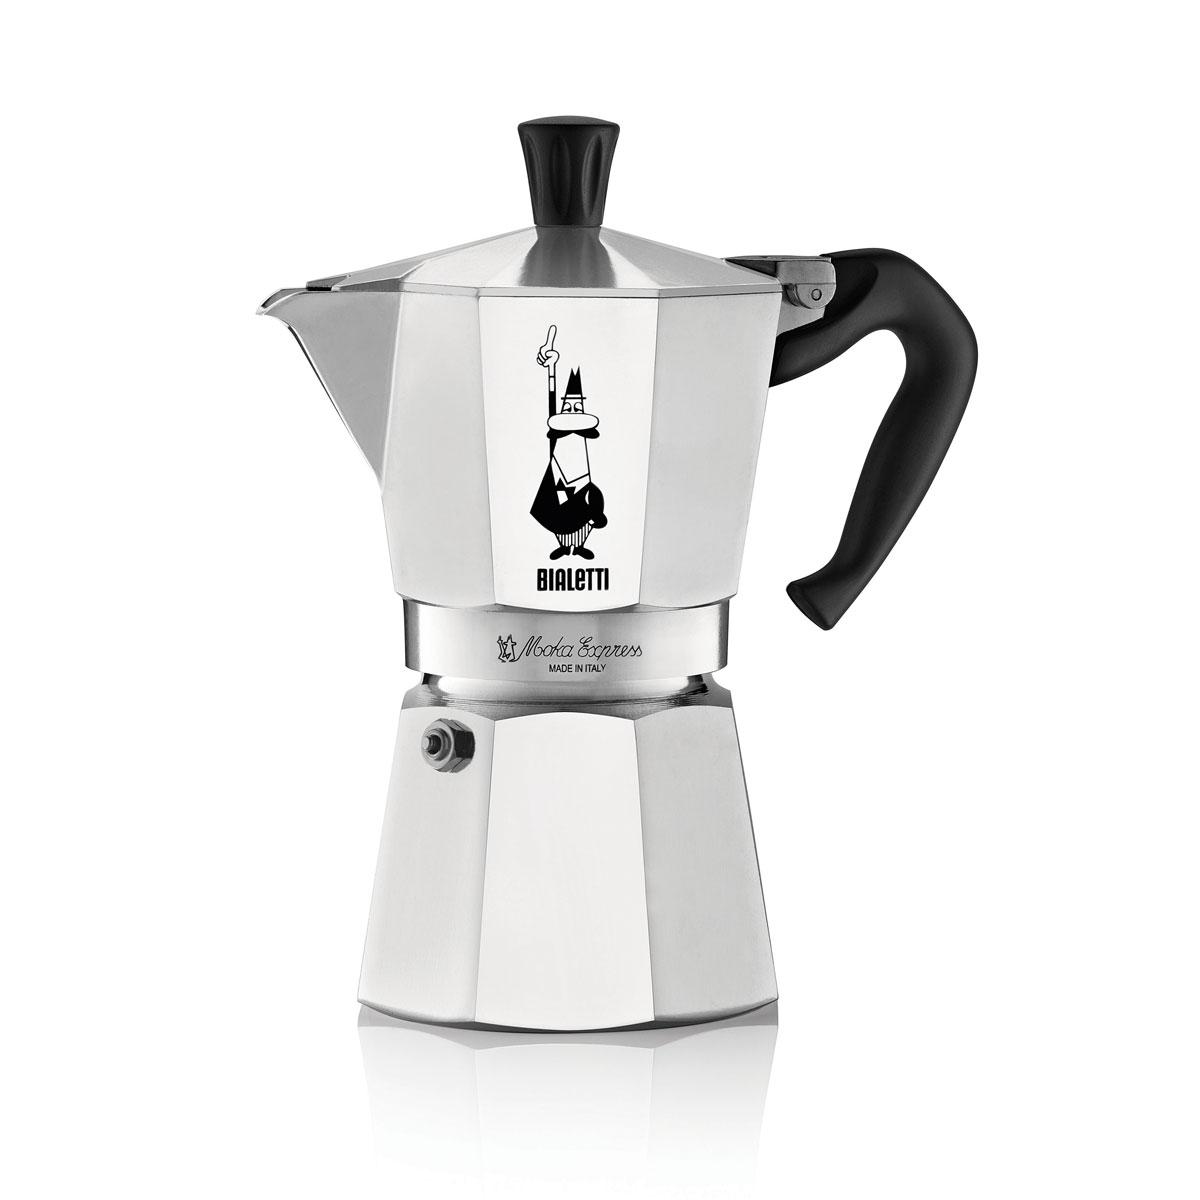 Espressokocher (6 Tassen)